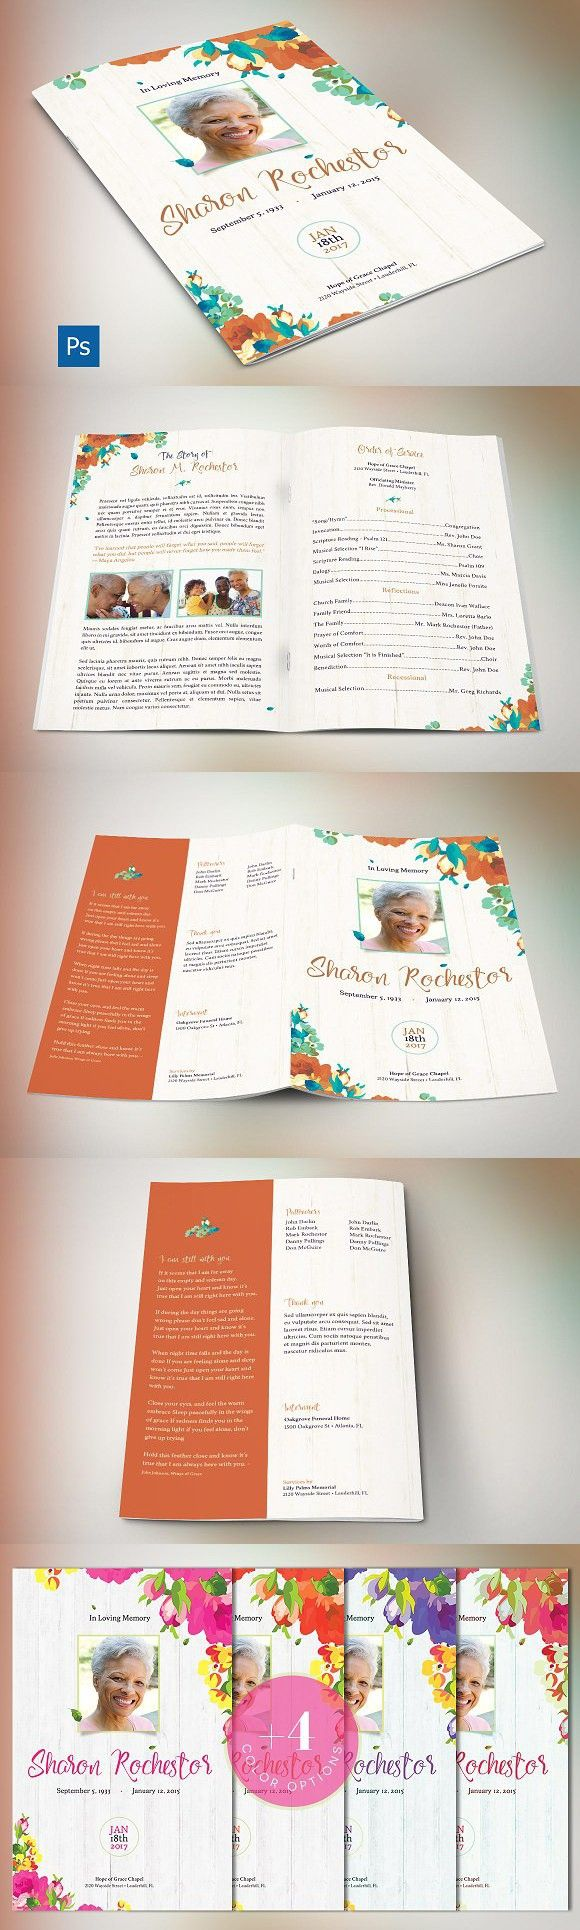 Autumn Floral Funeral Program. Wedding Card Templates